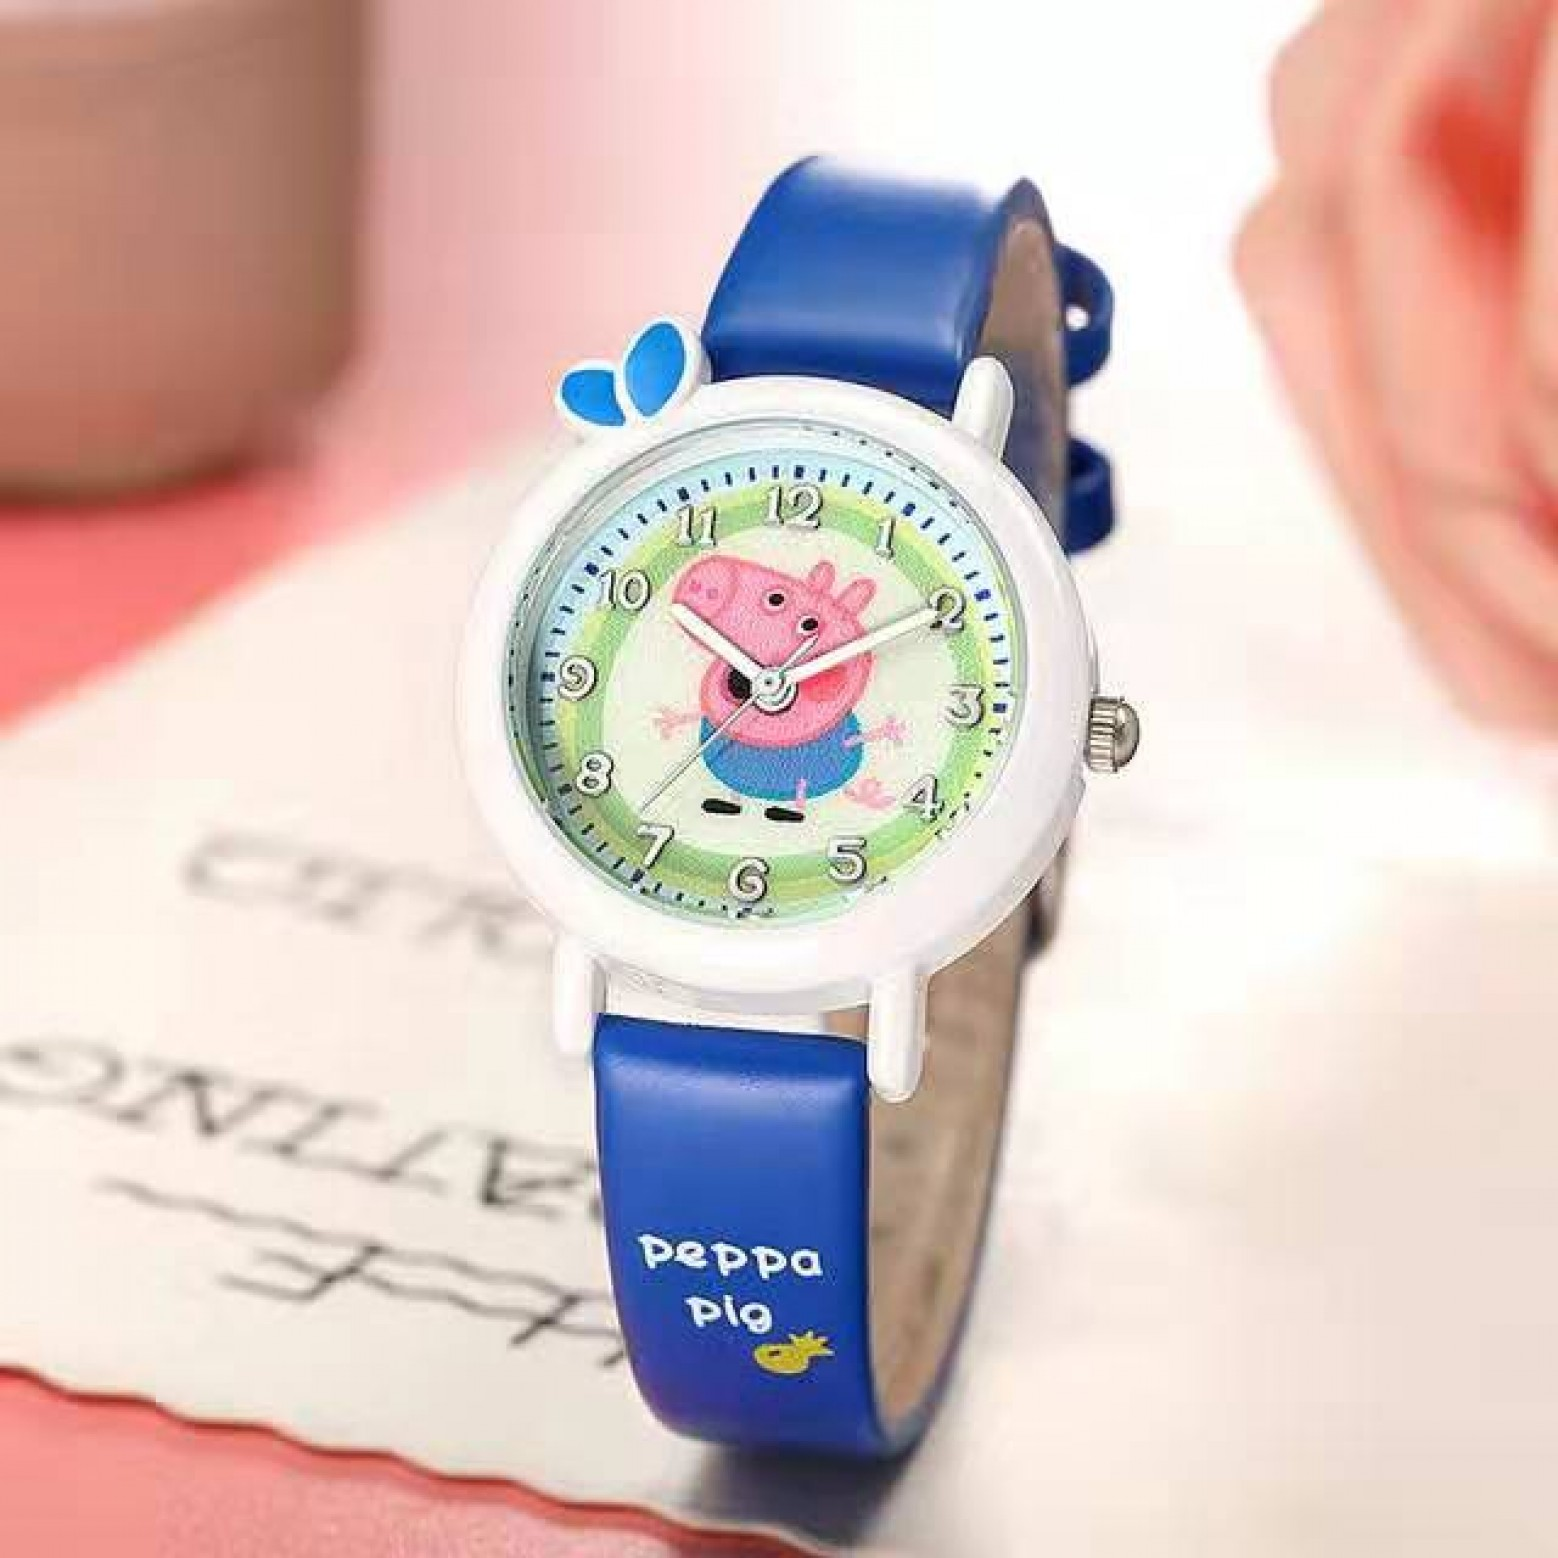 Peppa pig horloge blauw